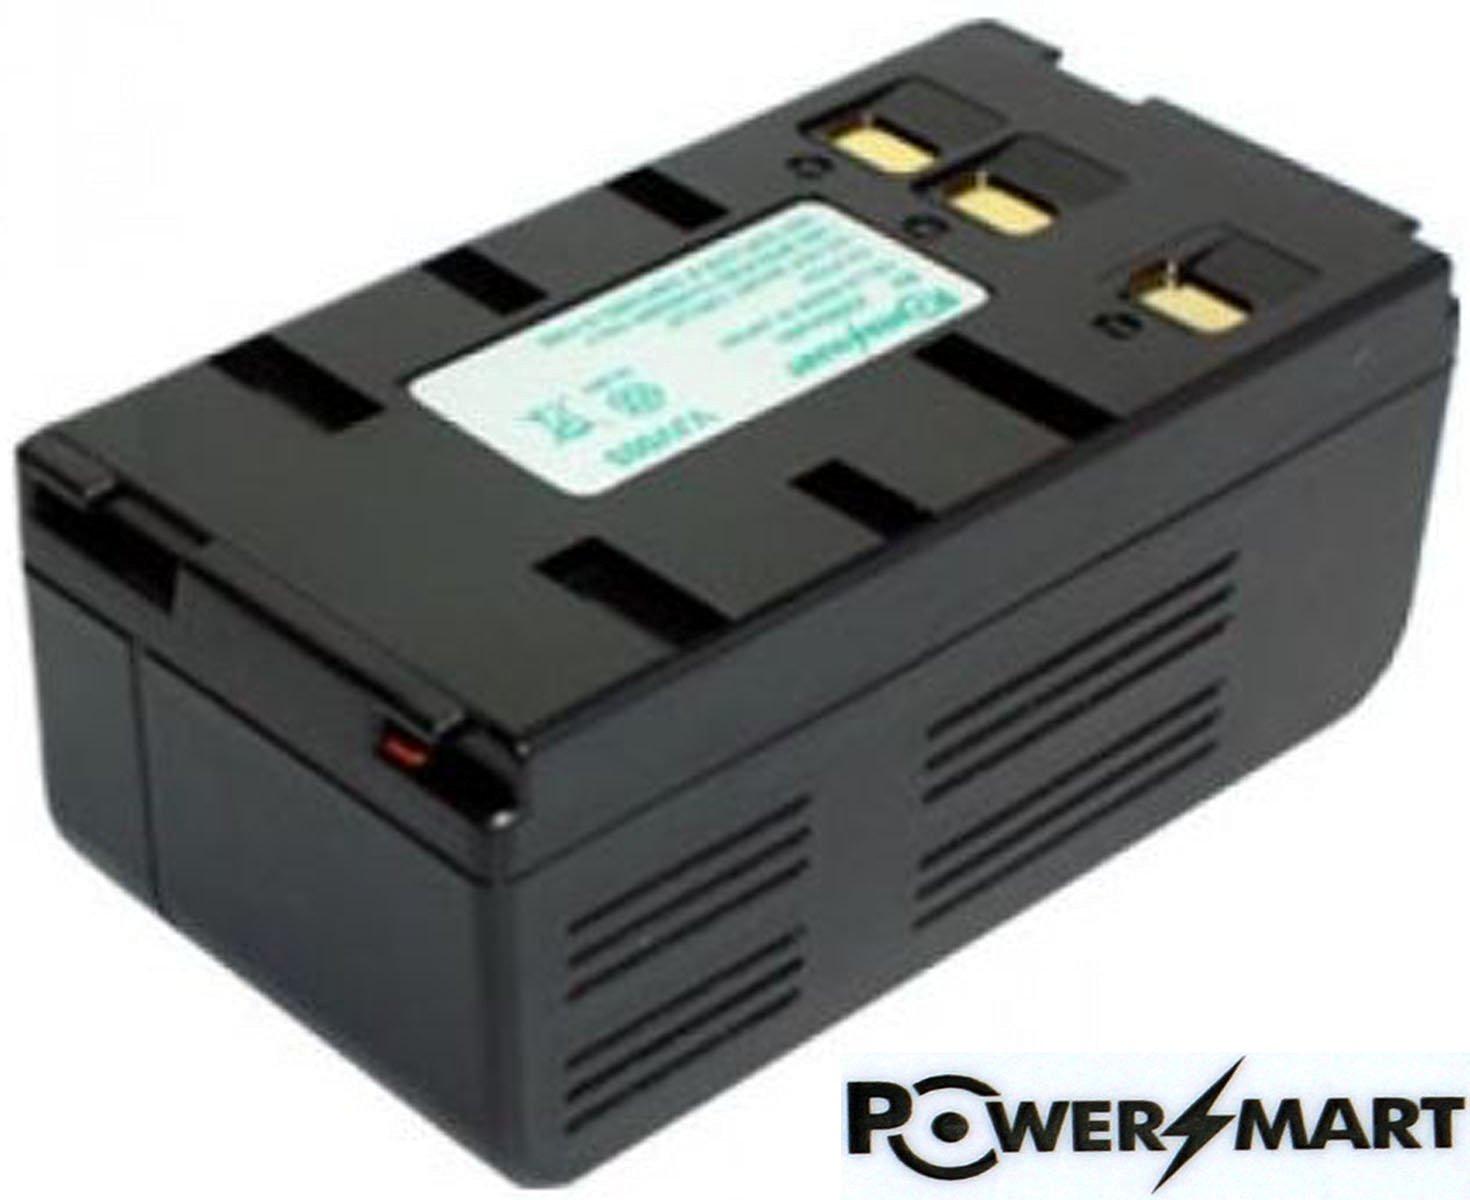 PowerSmart® 6V 4000 mAh Ni-MH Battery for Panasonic PV-L352 PV-L353 PV-L354 PV-L552 PV-L557 PV-L606 PV-L657 PV-L757 PV-L857 PV-S332 PV-S372